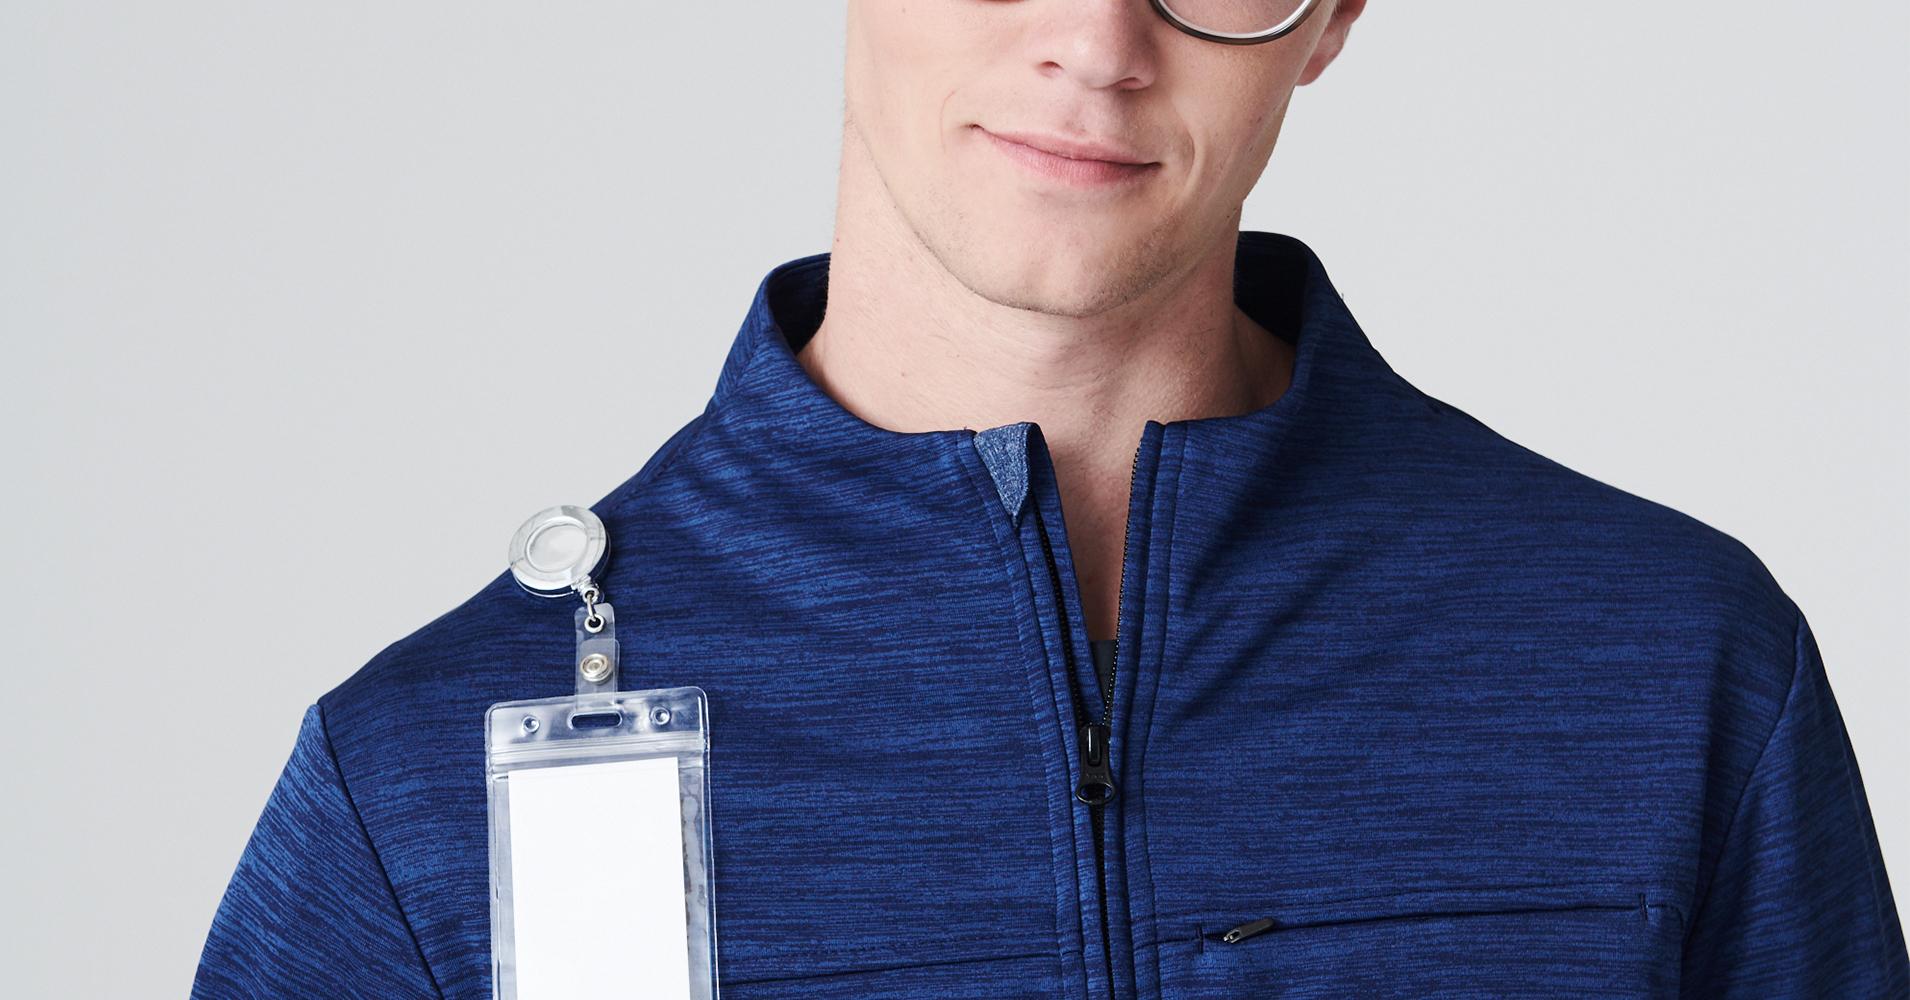 Best Scrub Jacket for Male Nurses & Medical Professionals